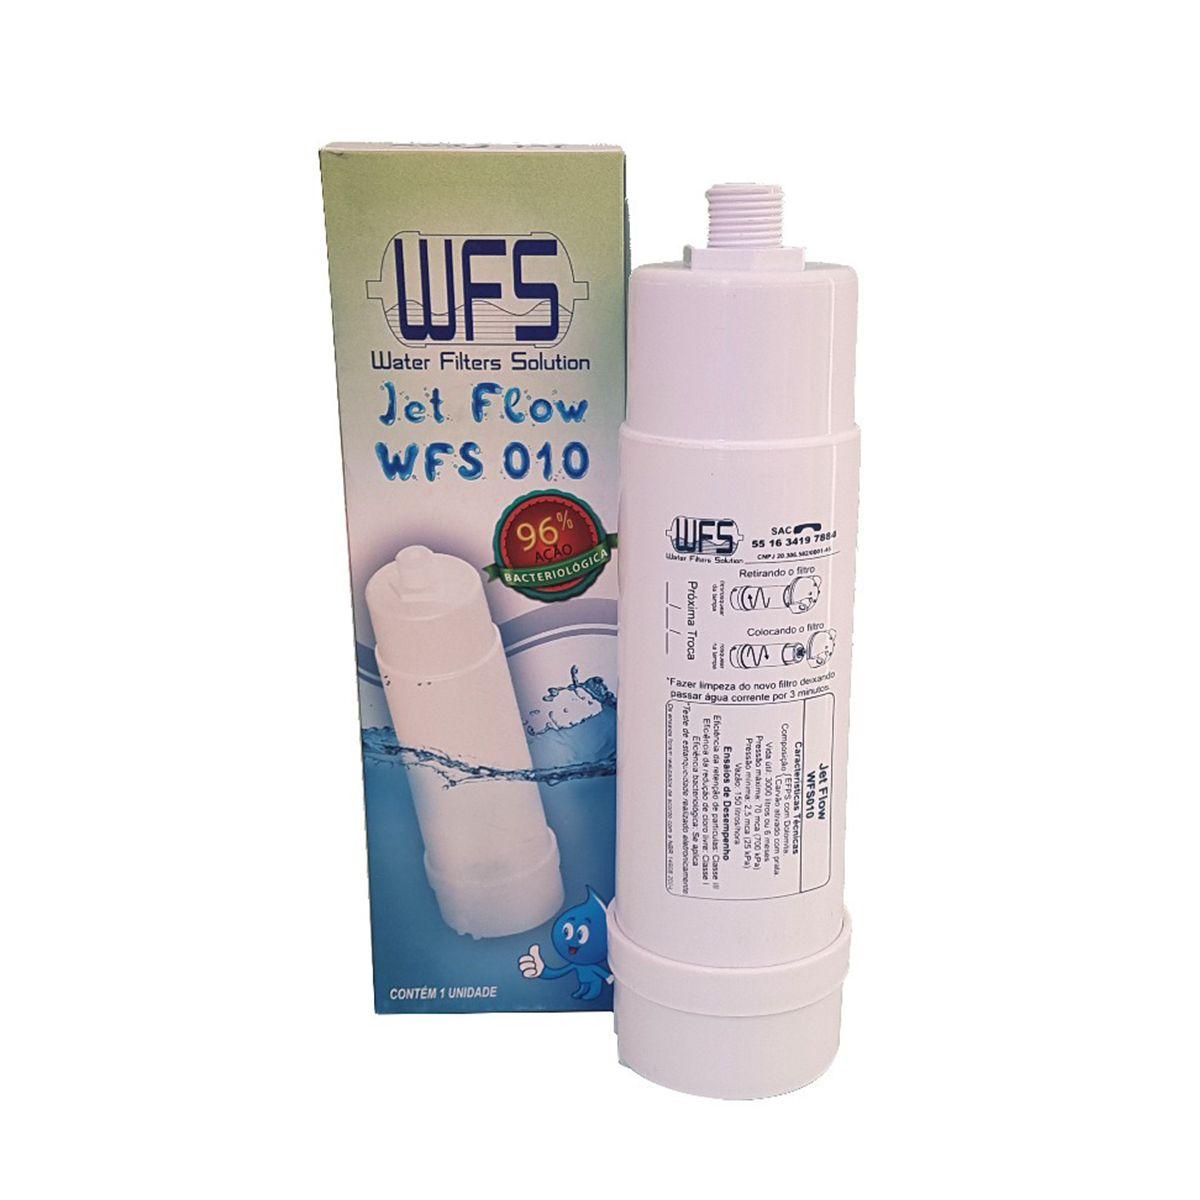 Refil WFS 010 - Jet Flow  p/ Aqualar AP230 3M/Cuno